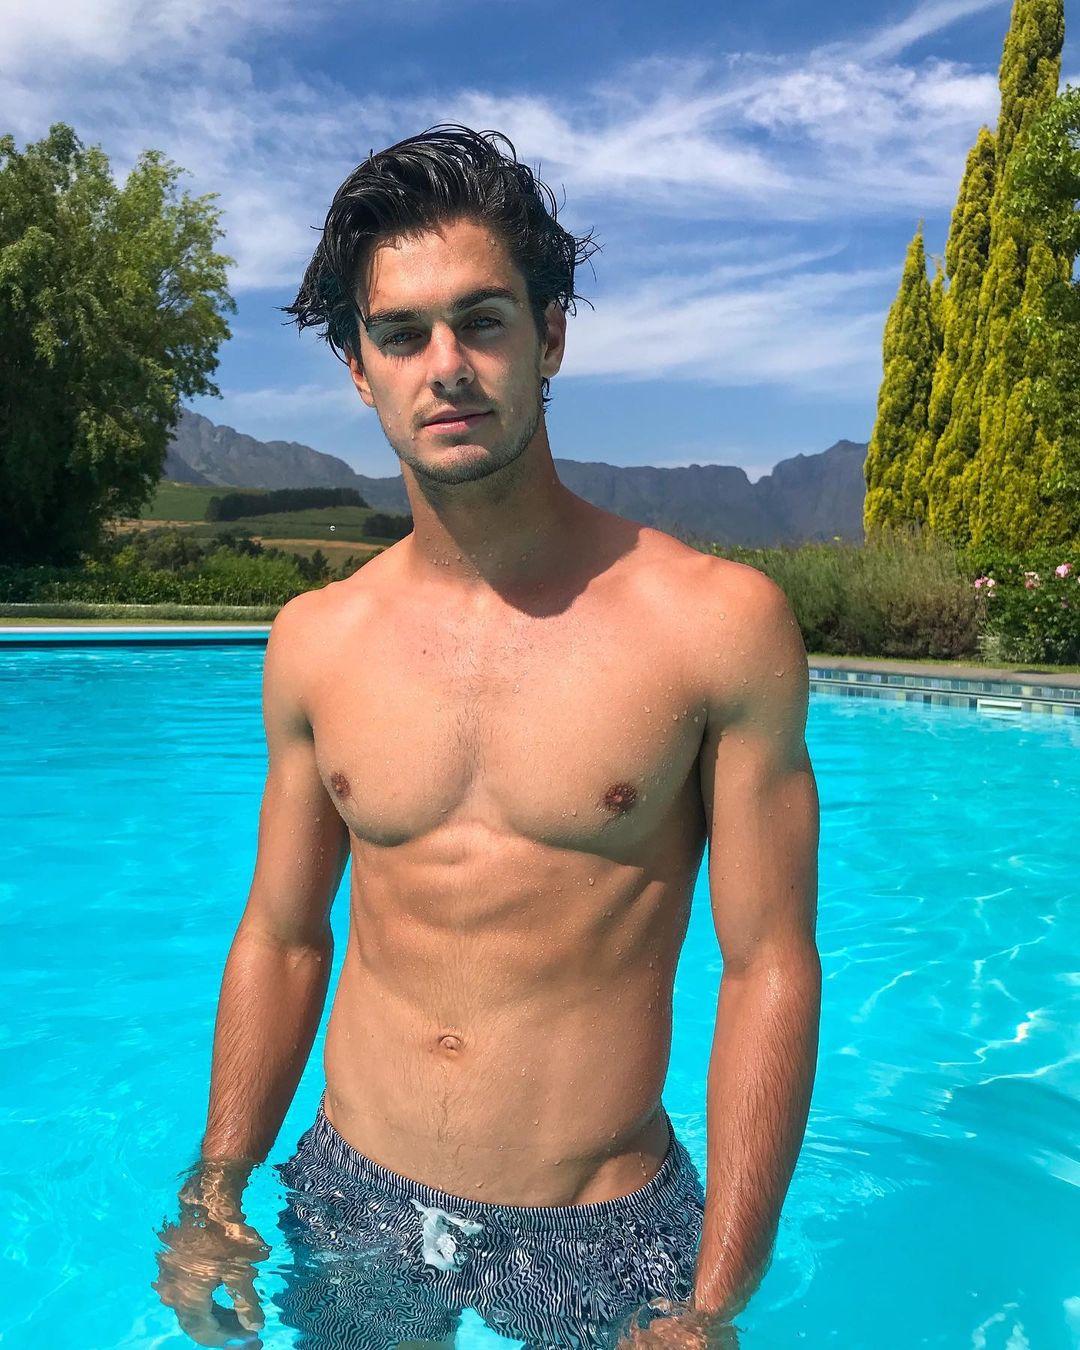 young-fit-shirtless-wet-body-dude-karl-kugelmann-pool-boy-pecs